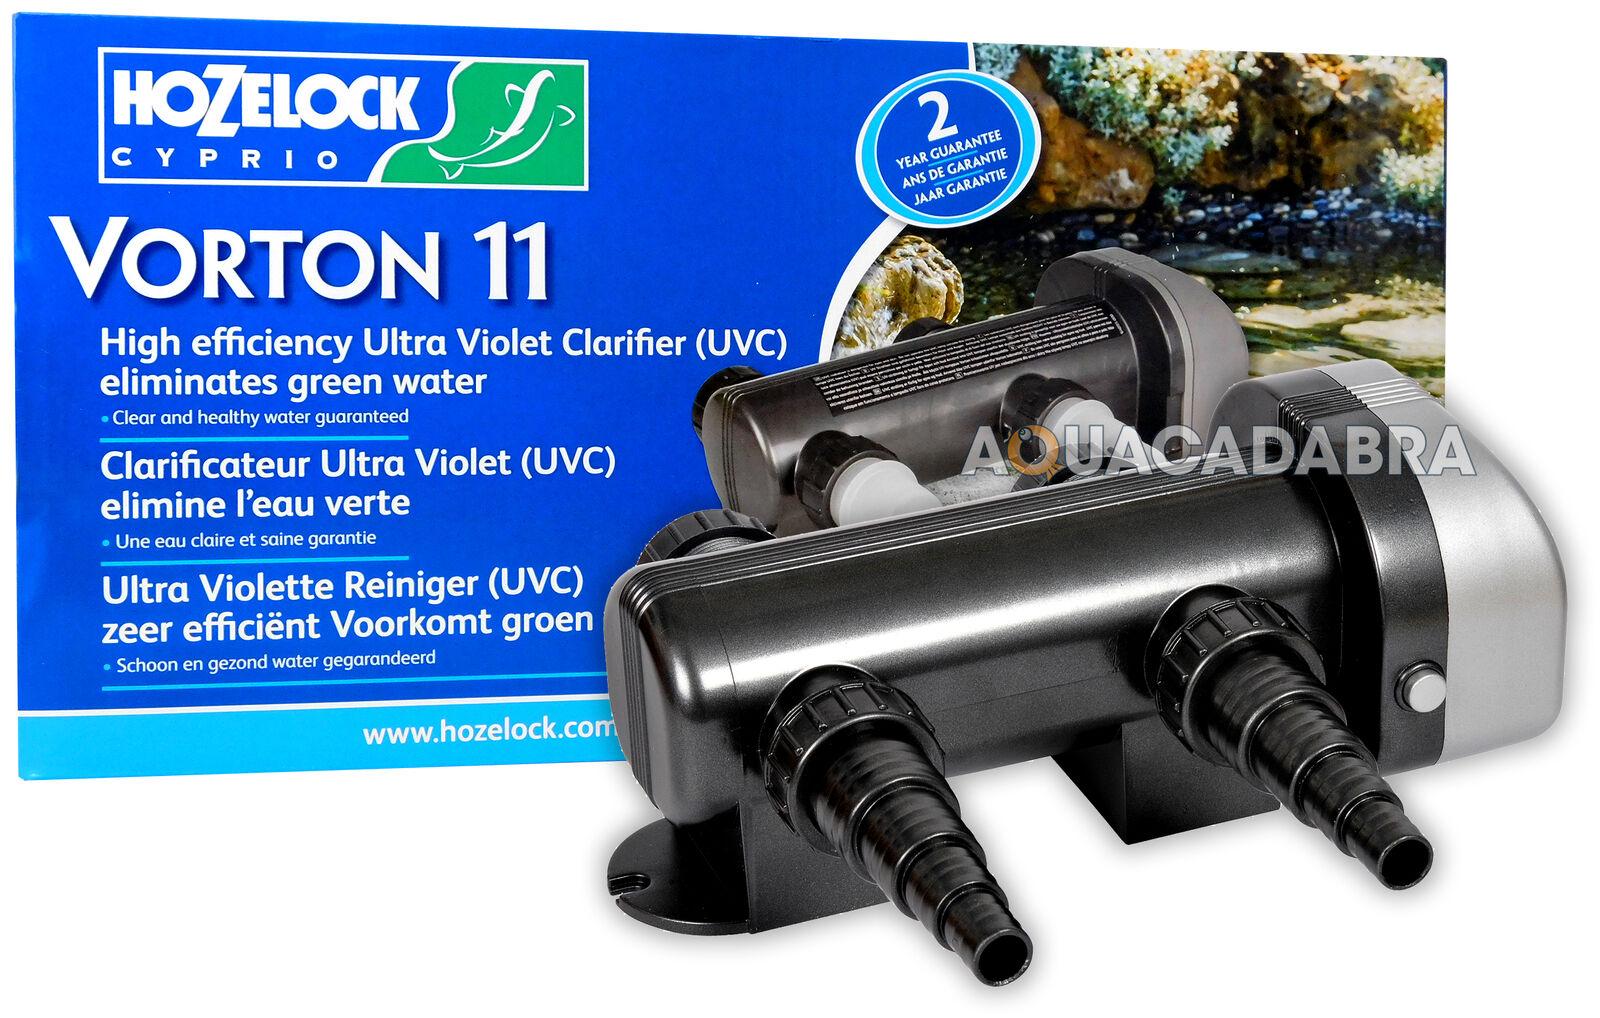 HOZELOCK Cyprio VORTON 11w, 18w, 36w, 55w giardino acqua stagno di Koi Fish UV UVC